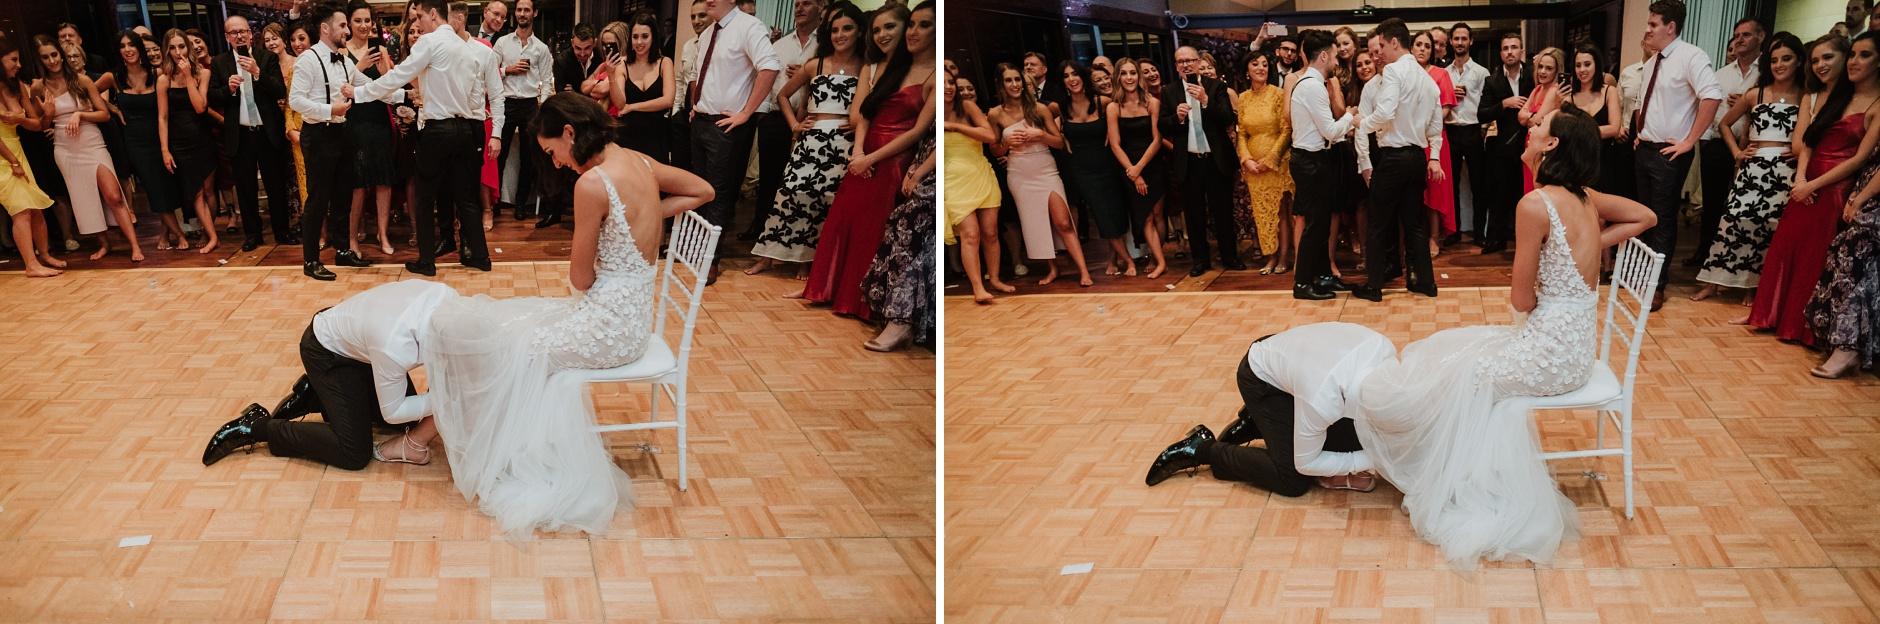 Sydney-Wedding-Photographer_0193.jpg